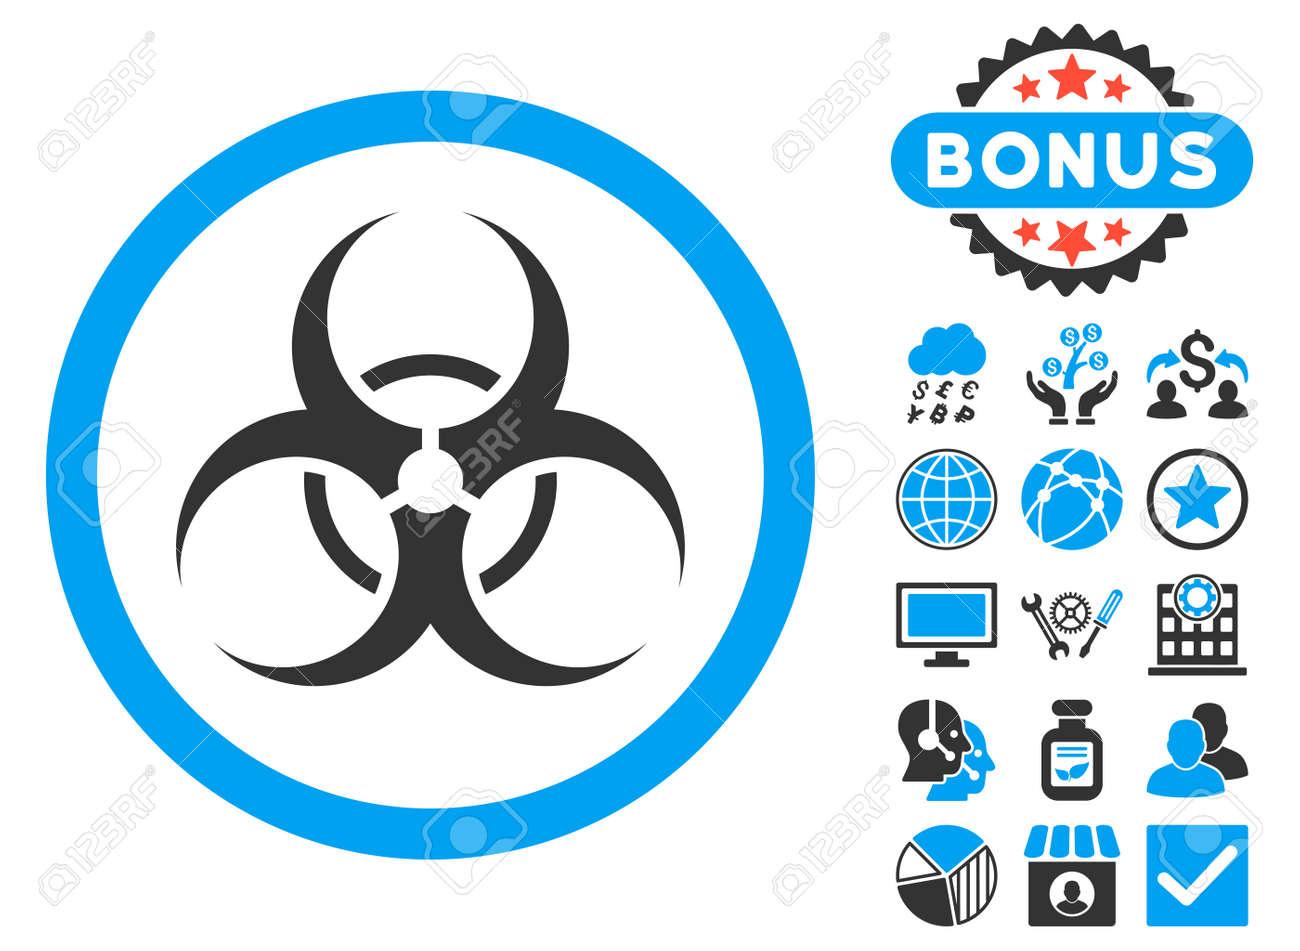 Biohazard symbol icon with bonus symbols vector illustration biohazard symbol icon with bonus symbols vector illustration style is flat iconic bicolor symbols biocorpaavc Images